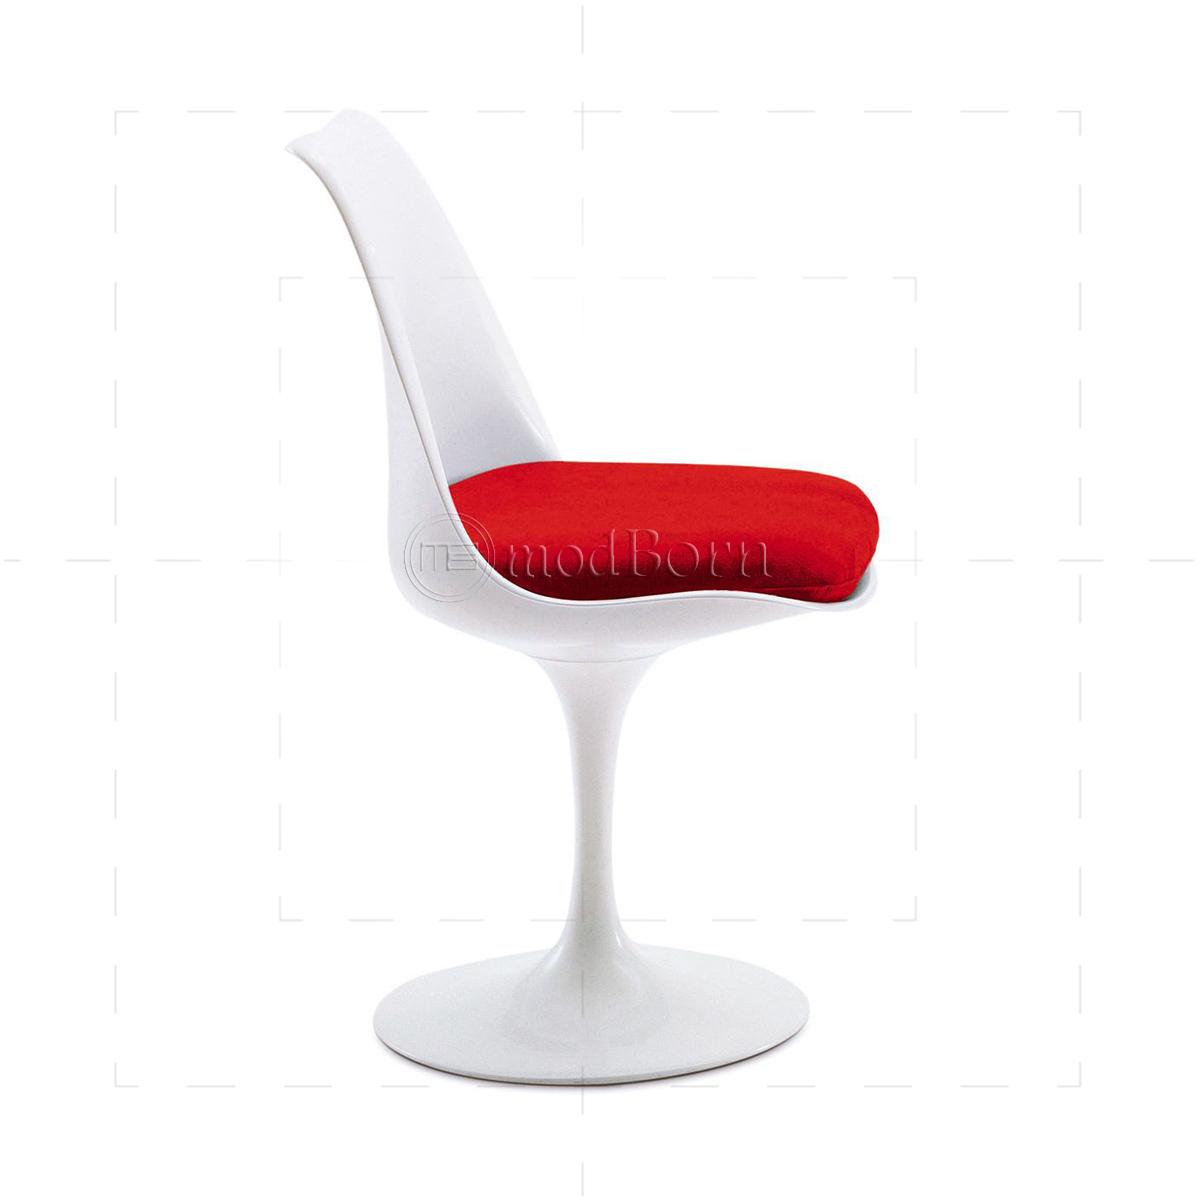 Eero saarinen style tulip chair white replica - Replica tulip chair ...